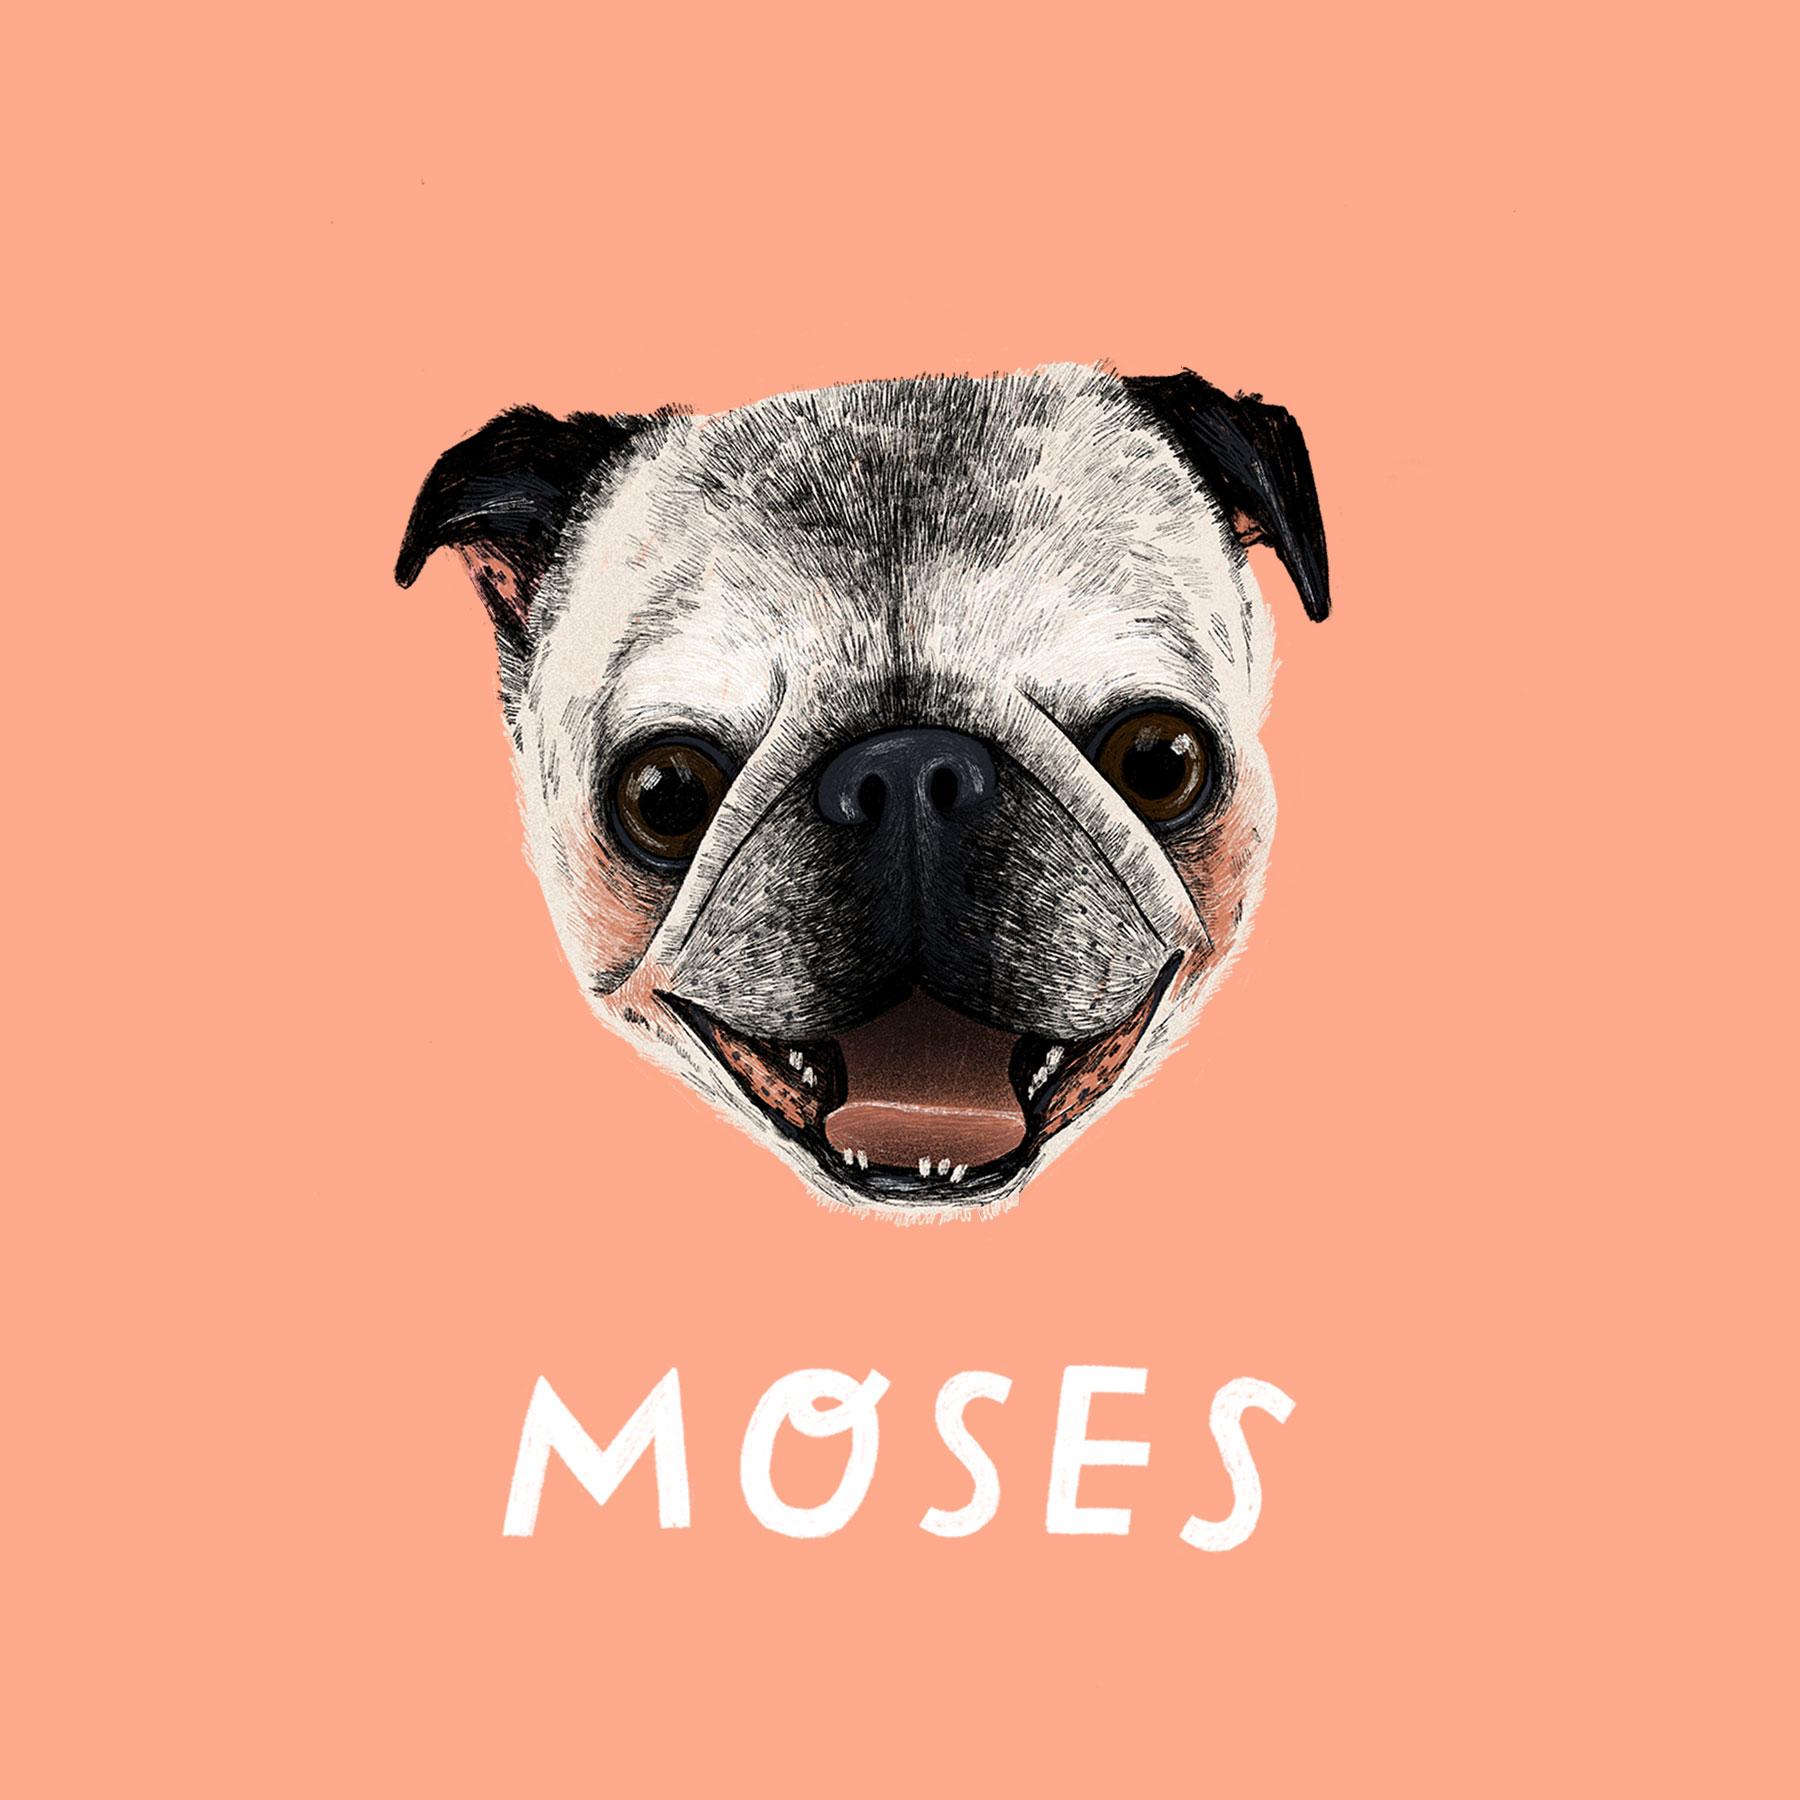 IG_Moses.jpg